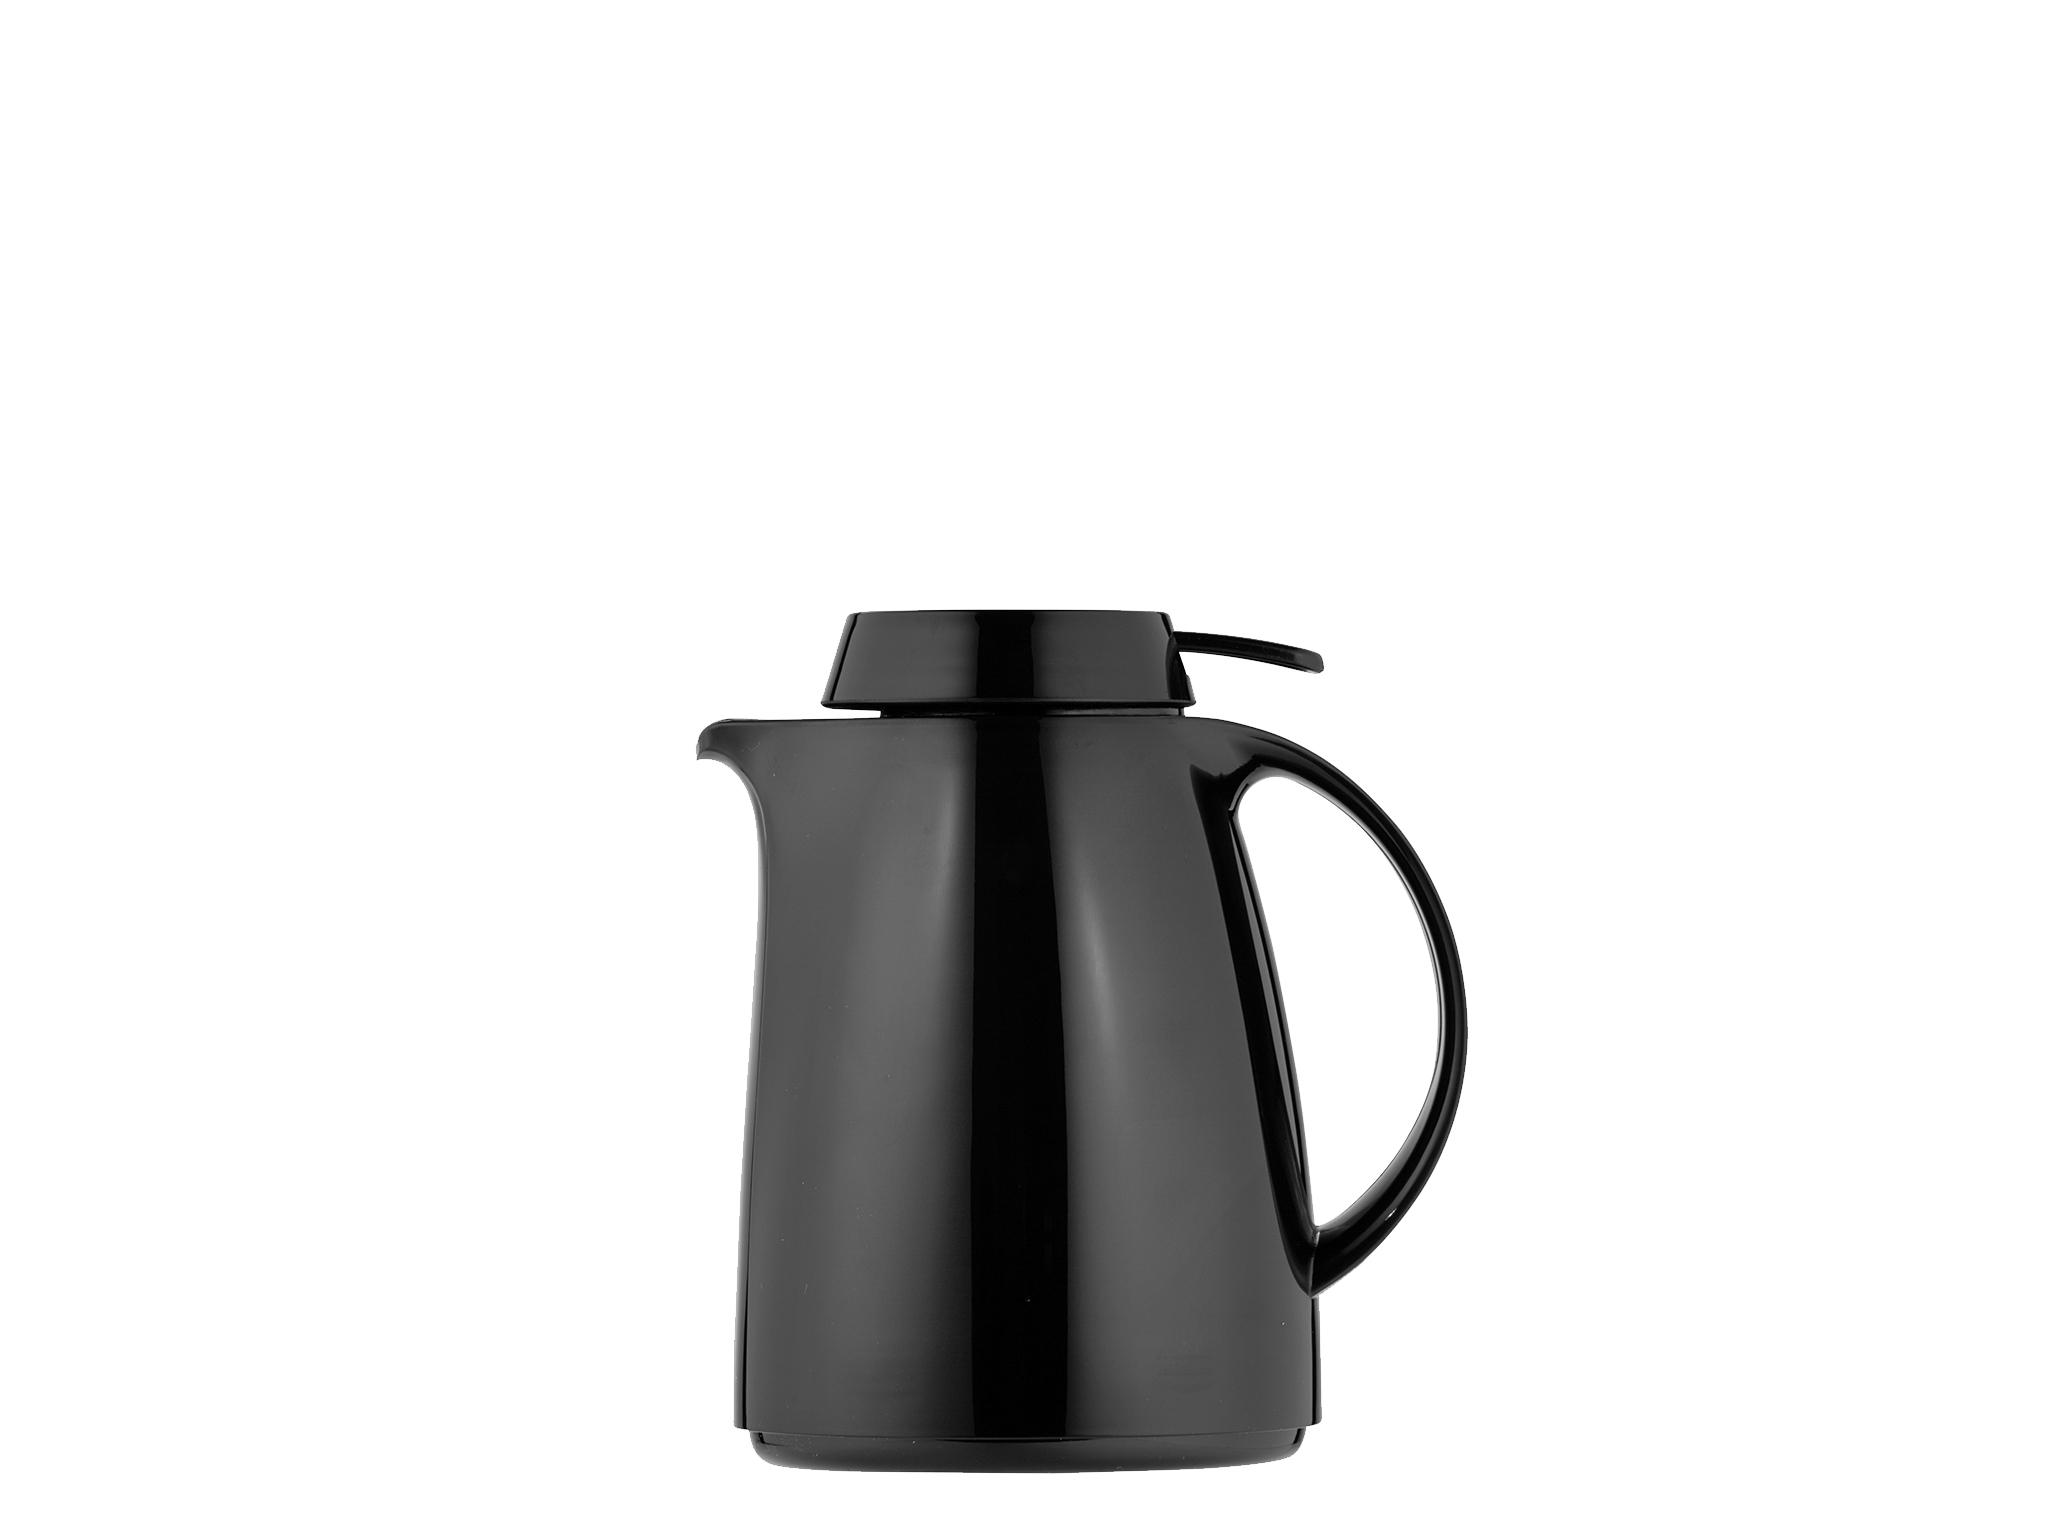 7201-002 - Vacuum carafe black 0.3 L SERVITHERM - Helios